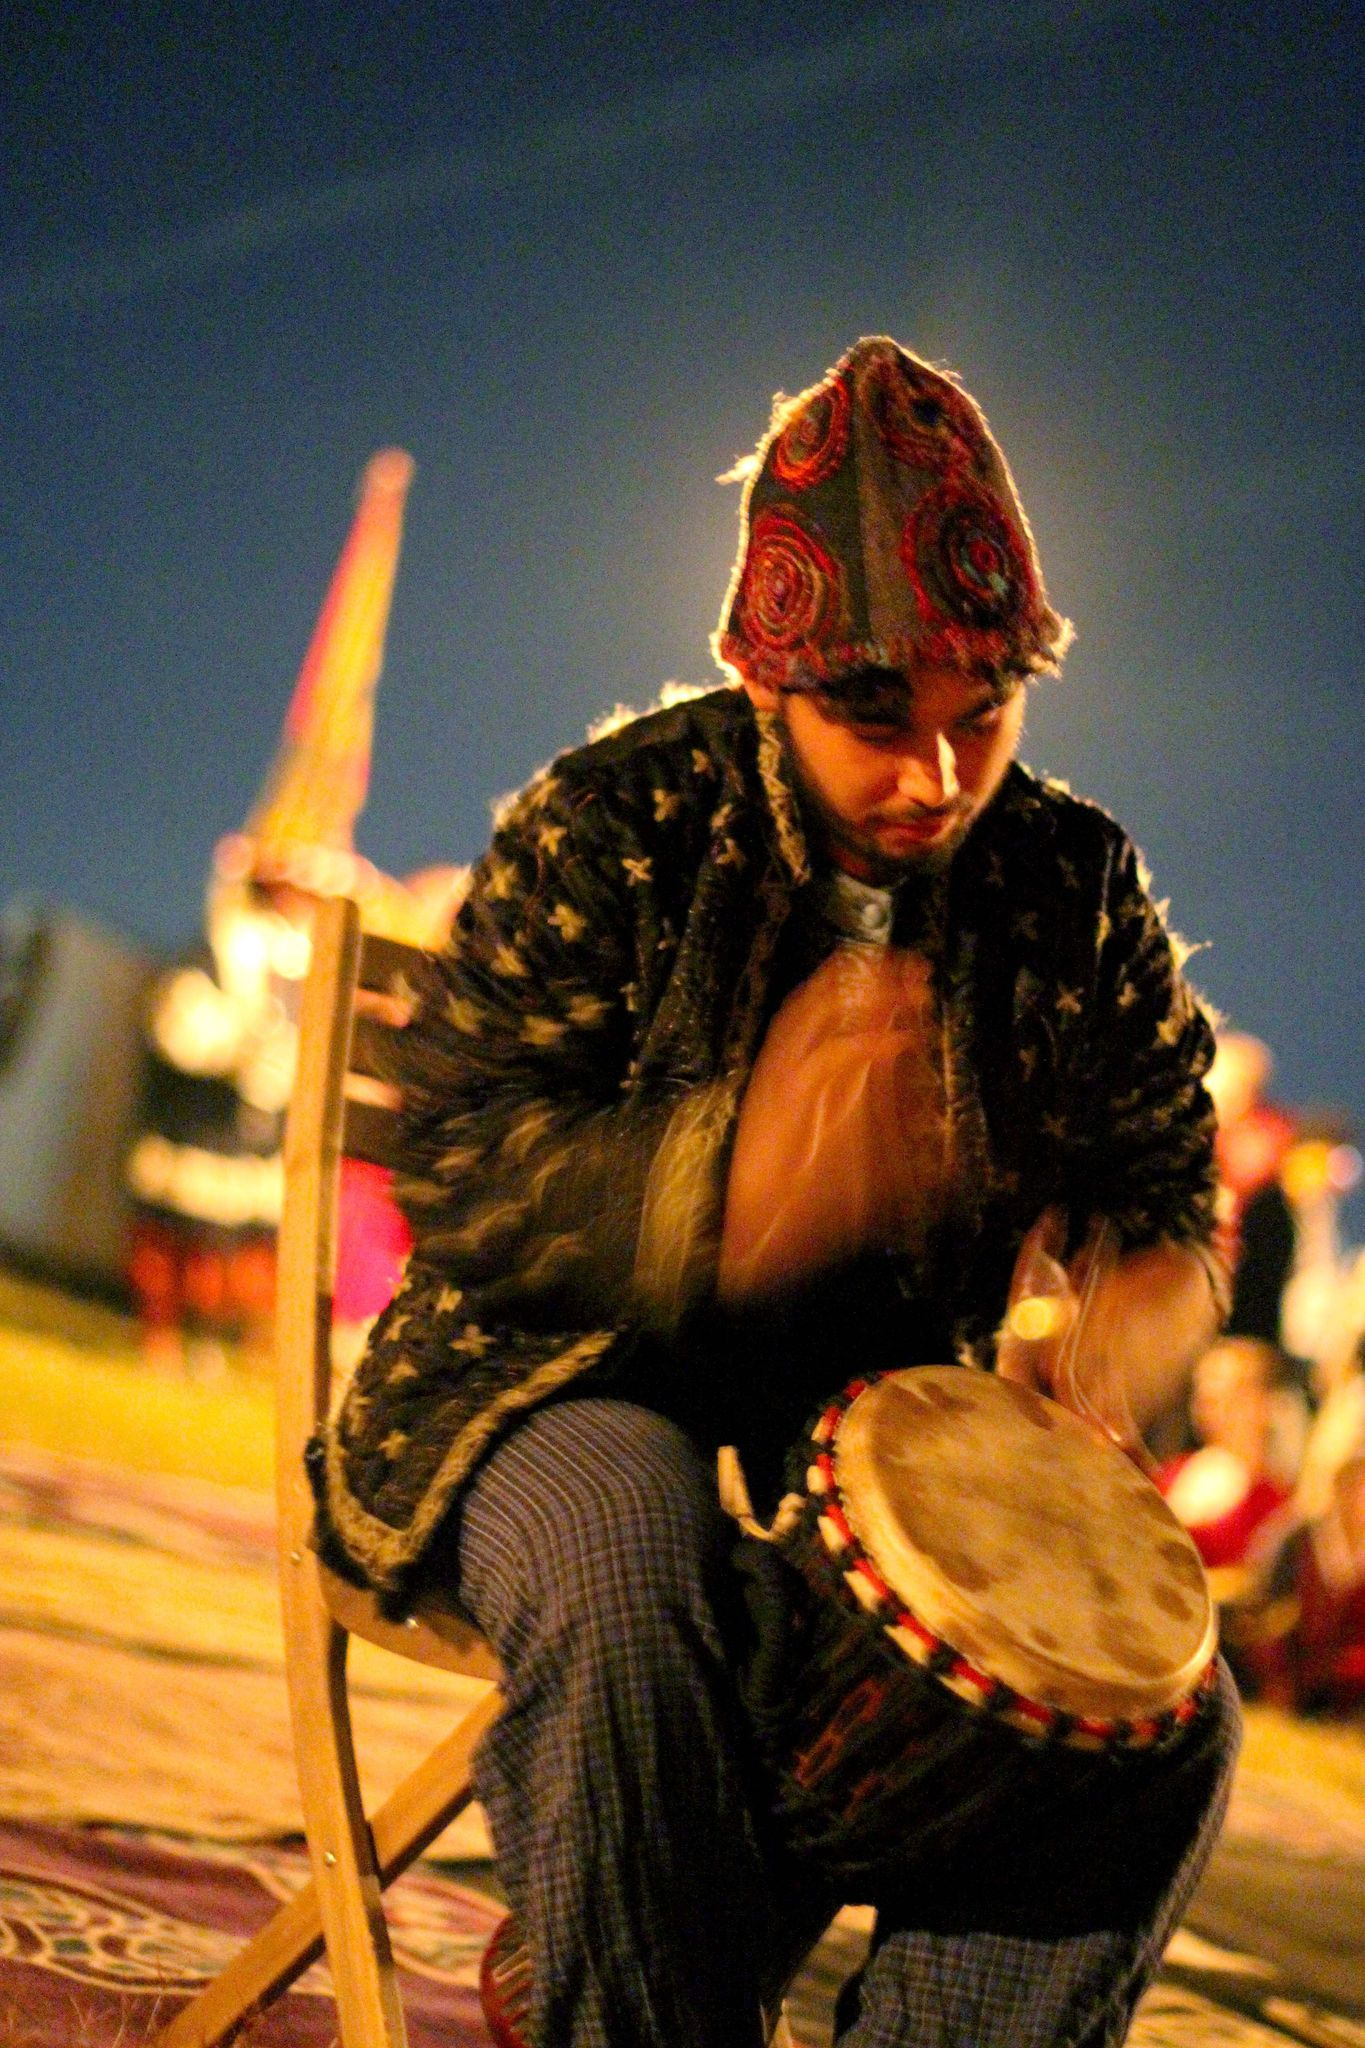 drummer at evening fireside